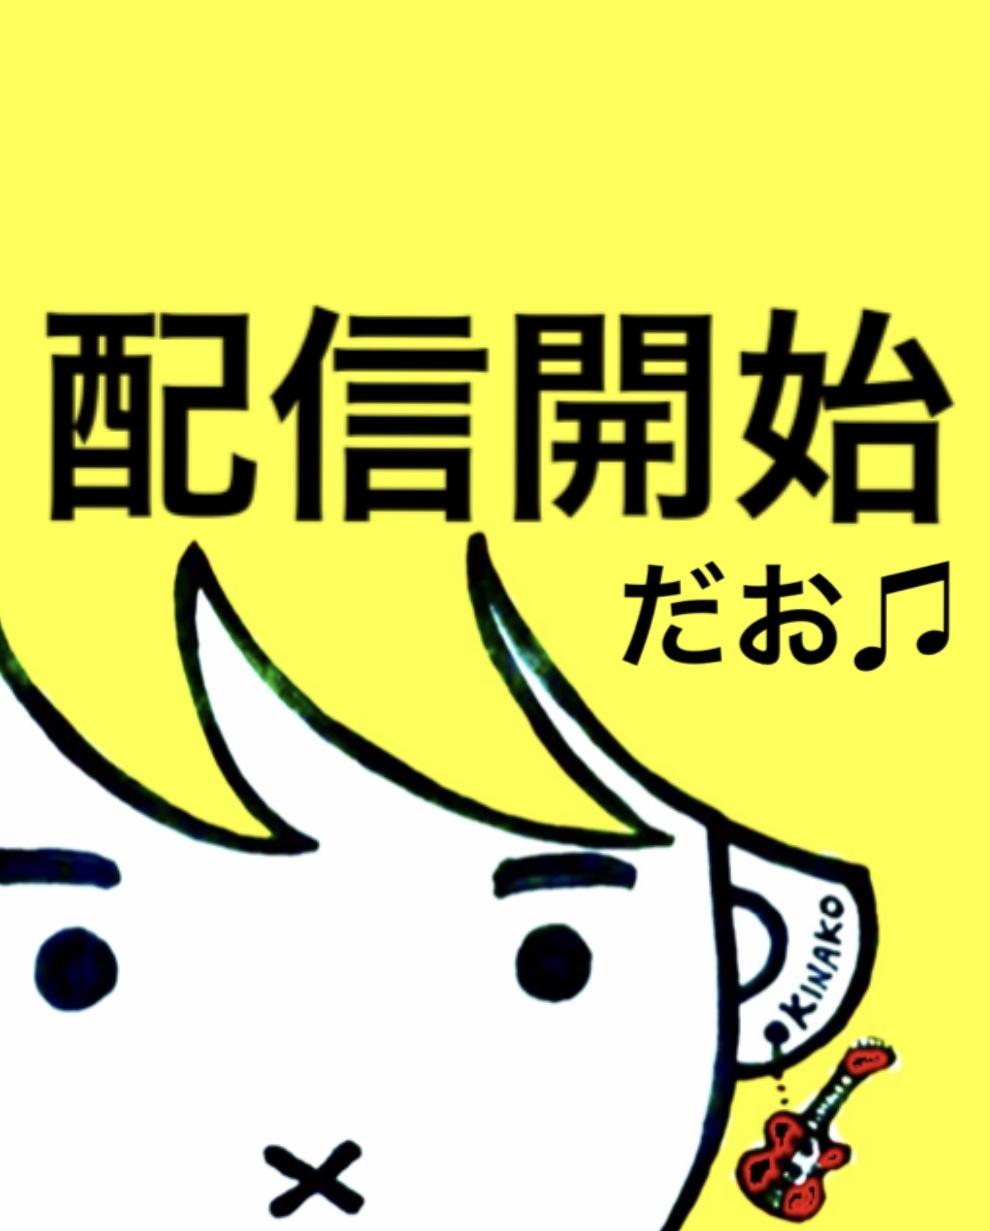 KINAKO「39」single 配信リリース_f0115311_19112846.jpeg